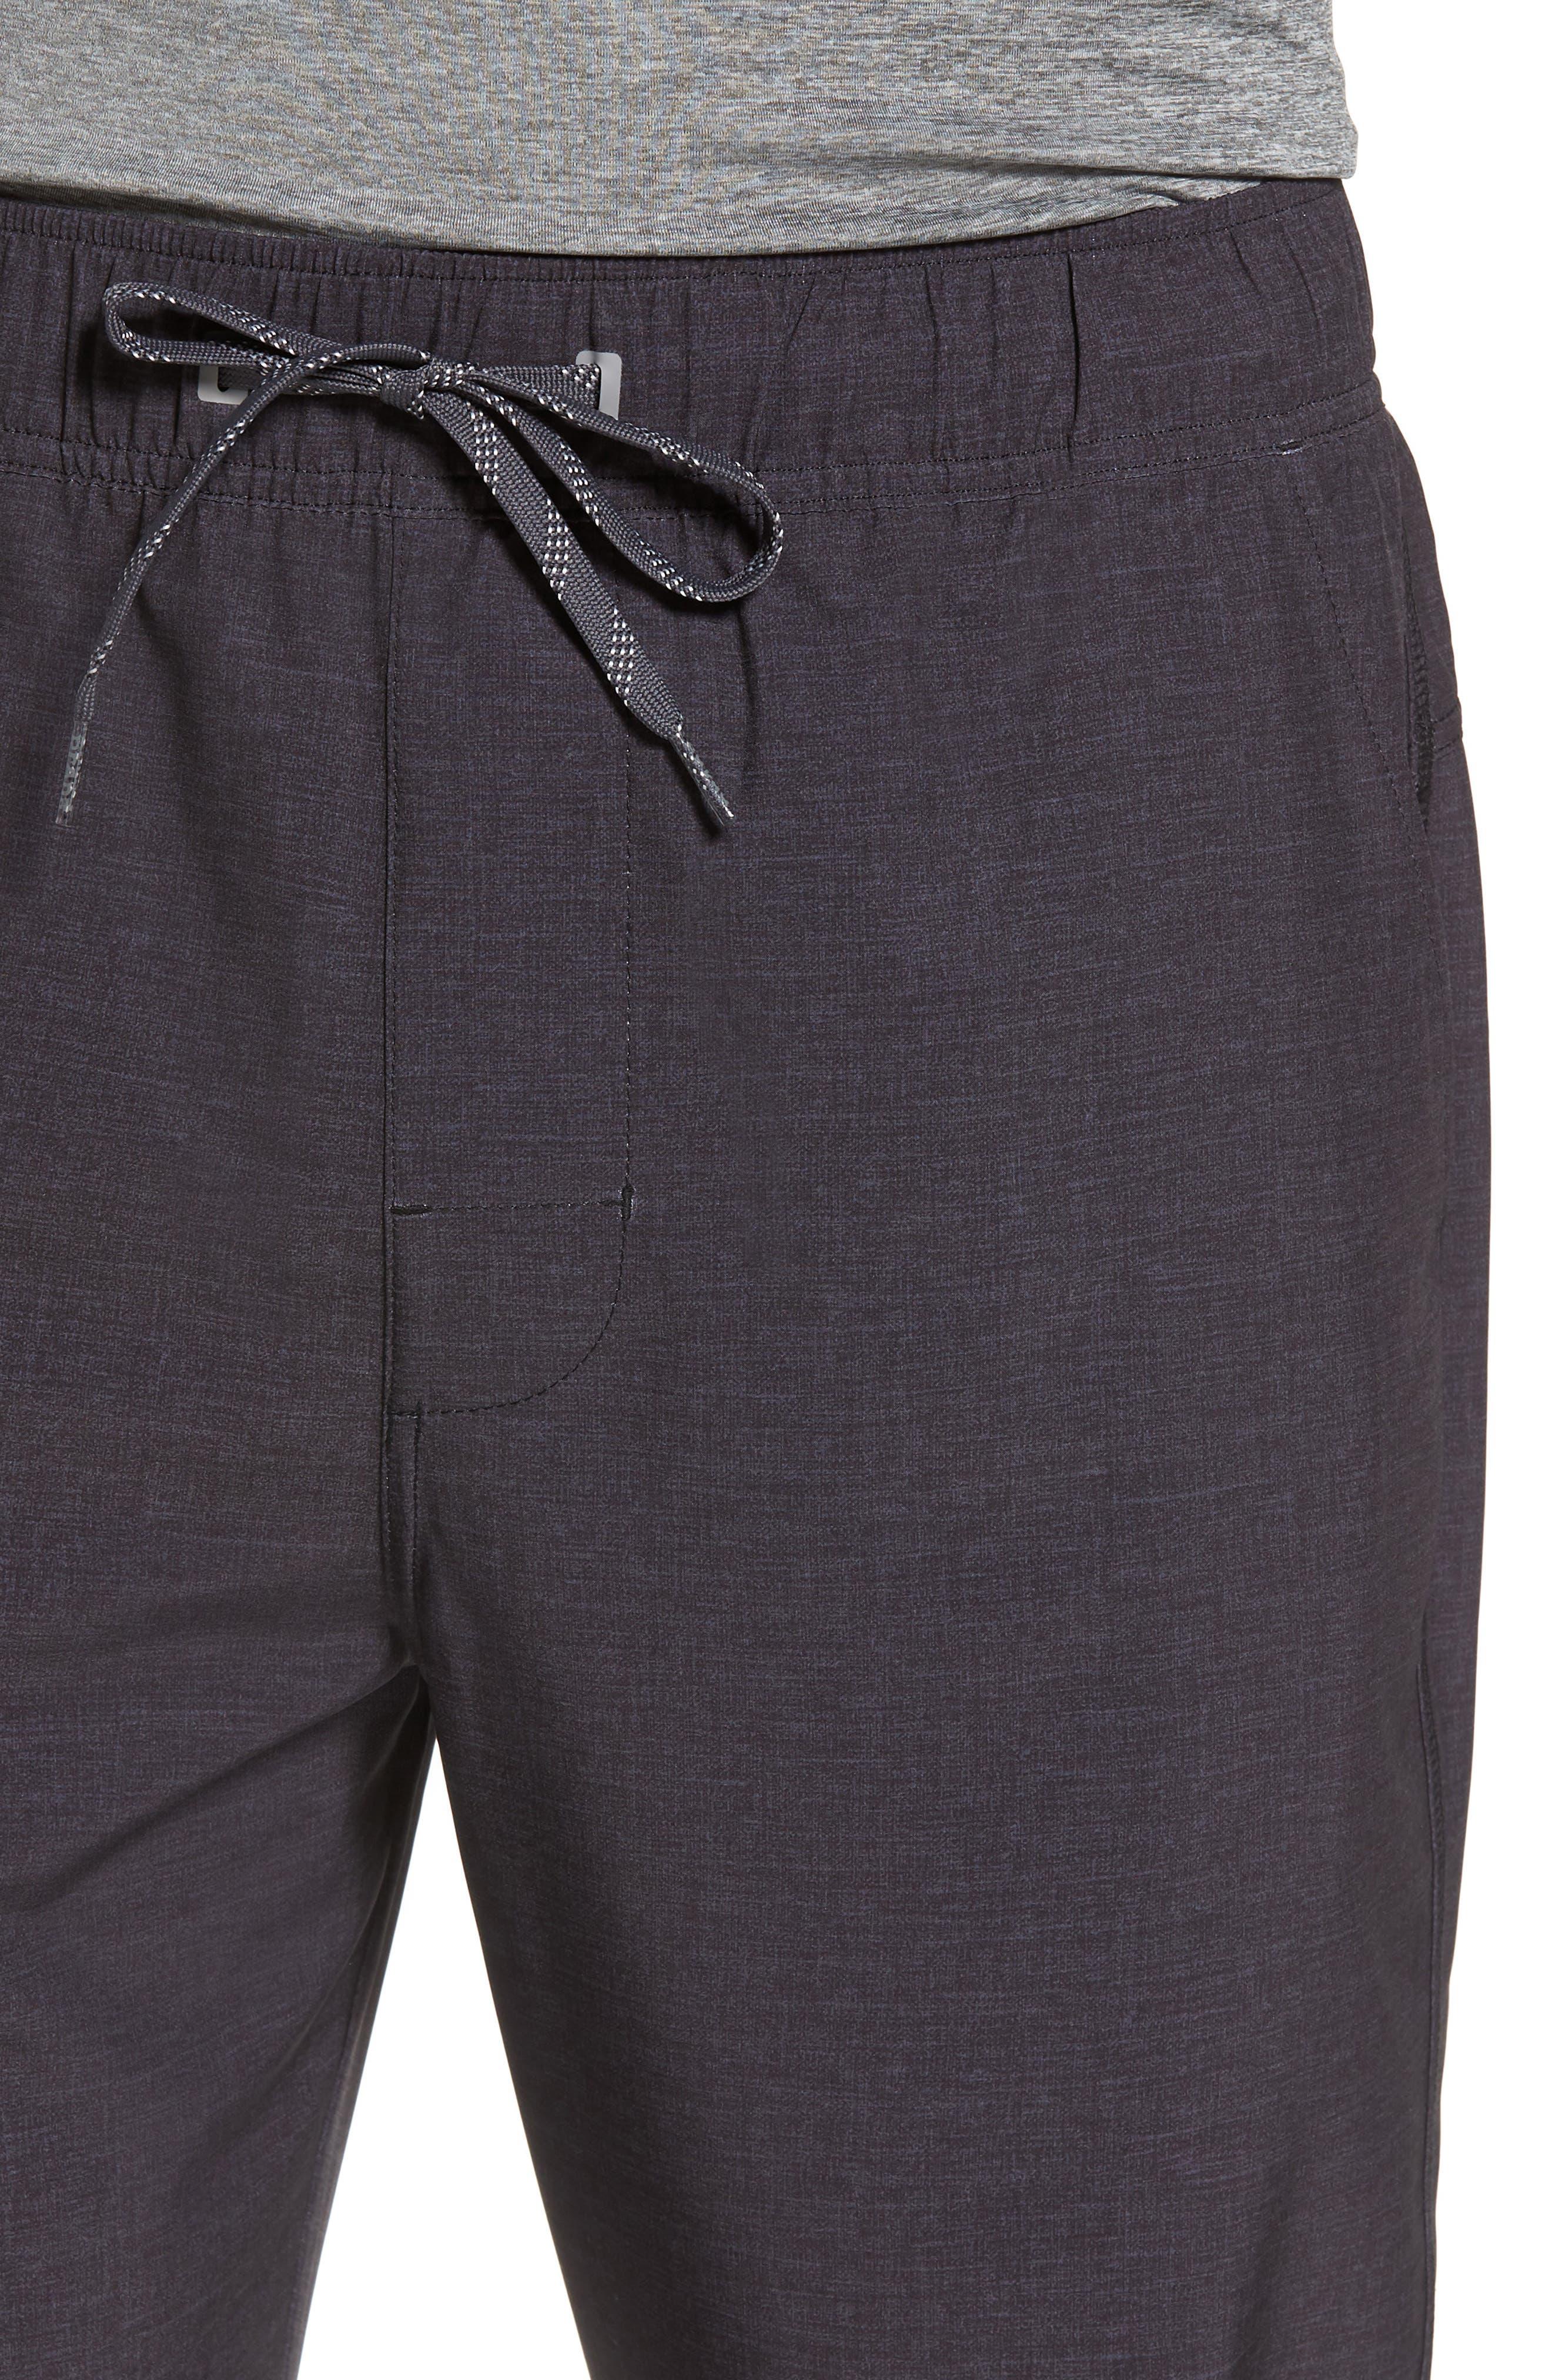 Spencer Jogger Pants,                             Alternate thumbnail 4, color,                             Black Heather